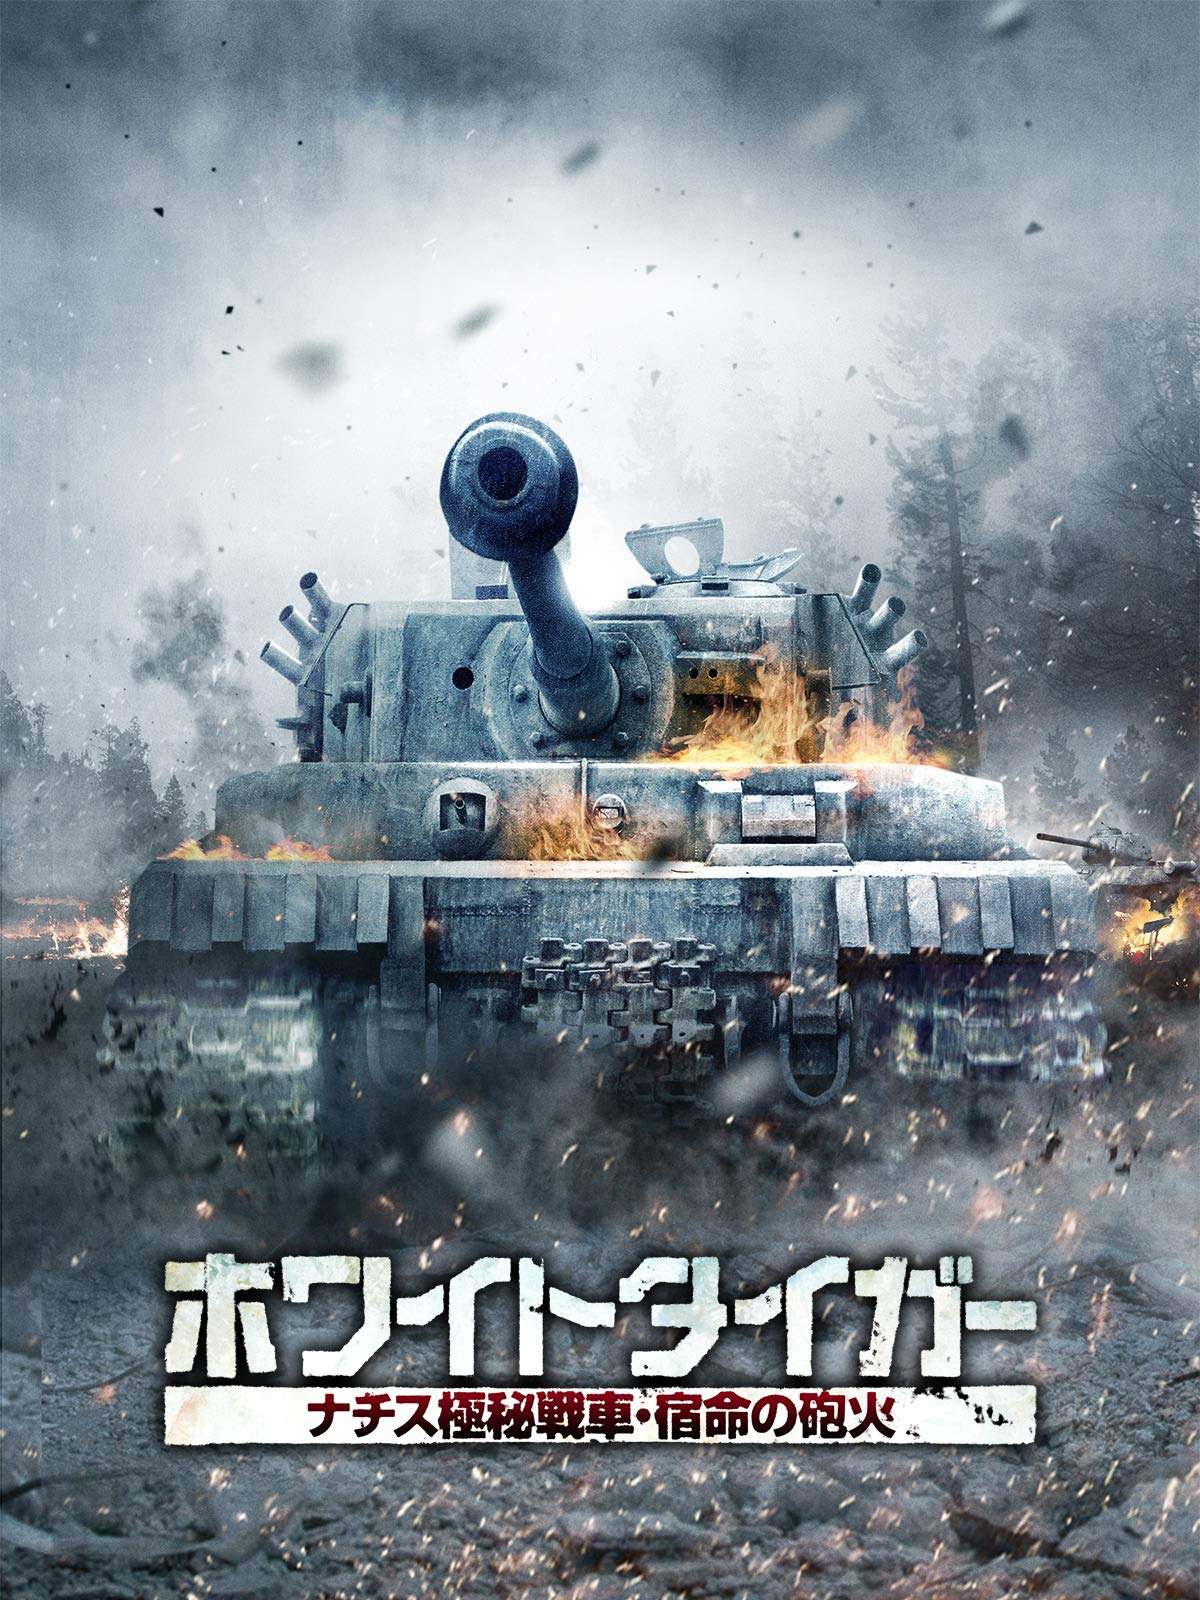 Amazon Co Jp ホワイトタイガー ナチス極秘戦車 宿命の砲火 字幕版 を観る Prime Video